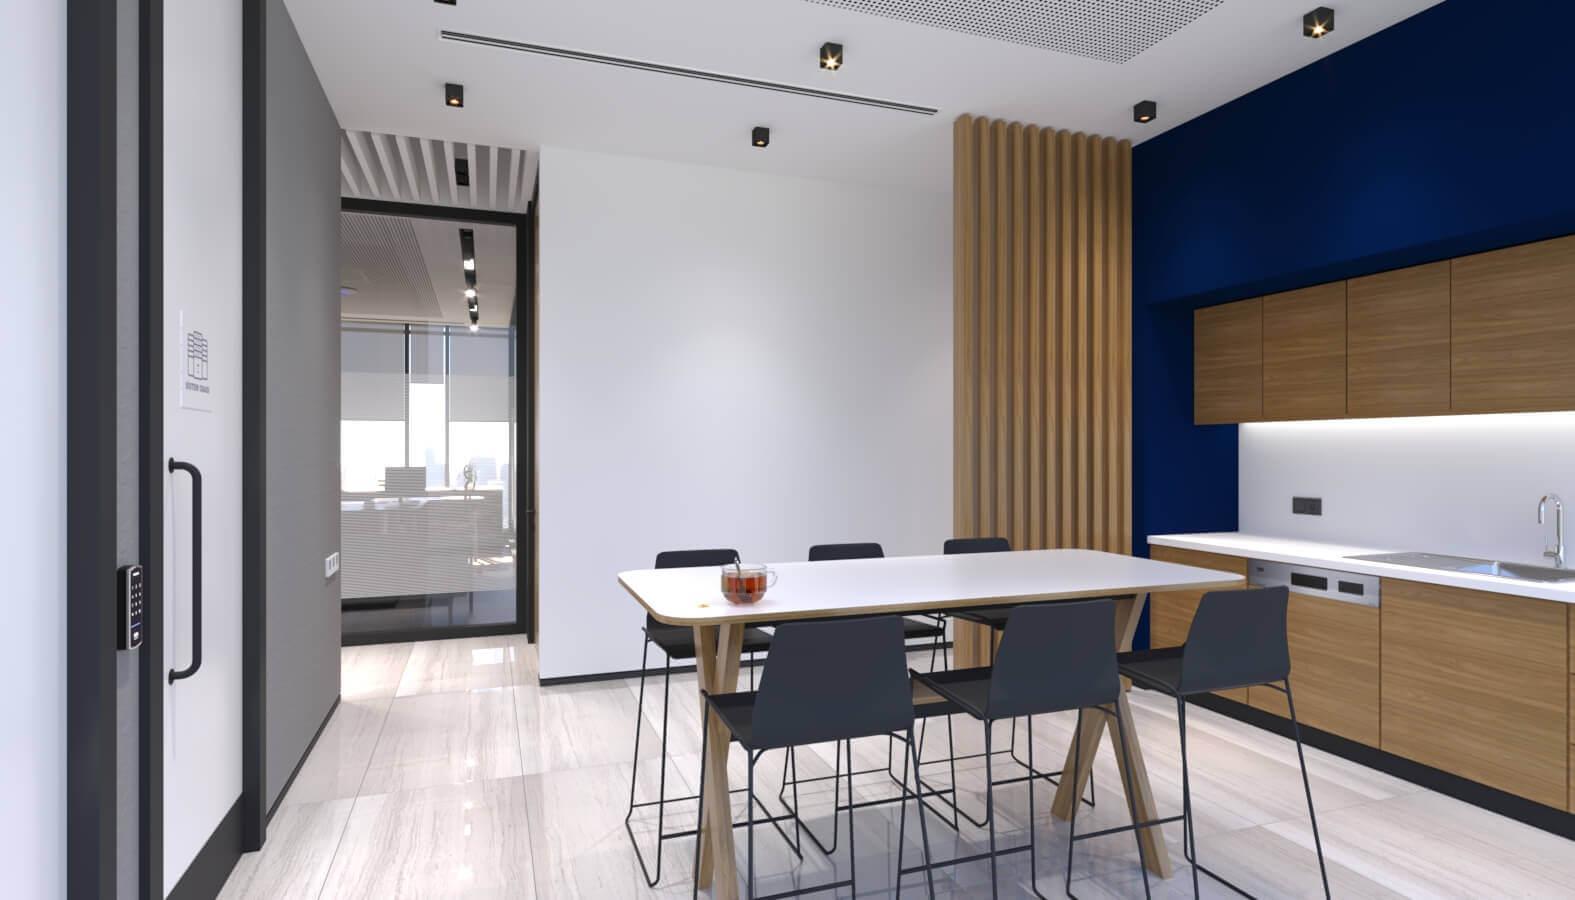 ofis içmimari 3843 Tüvtürk Ankara Ofis Ofisler